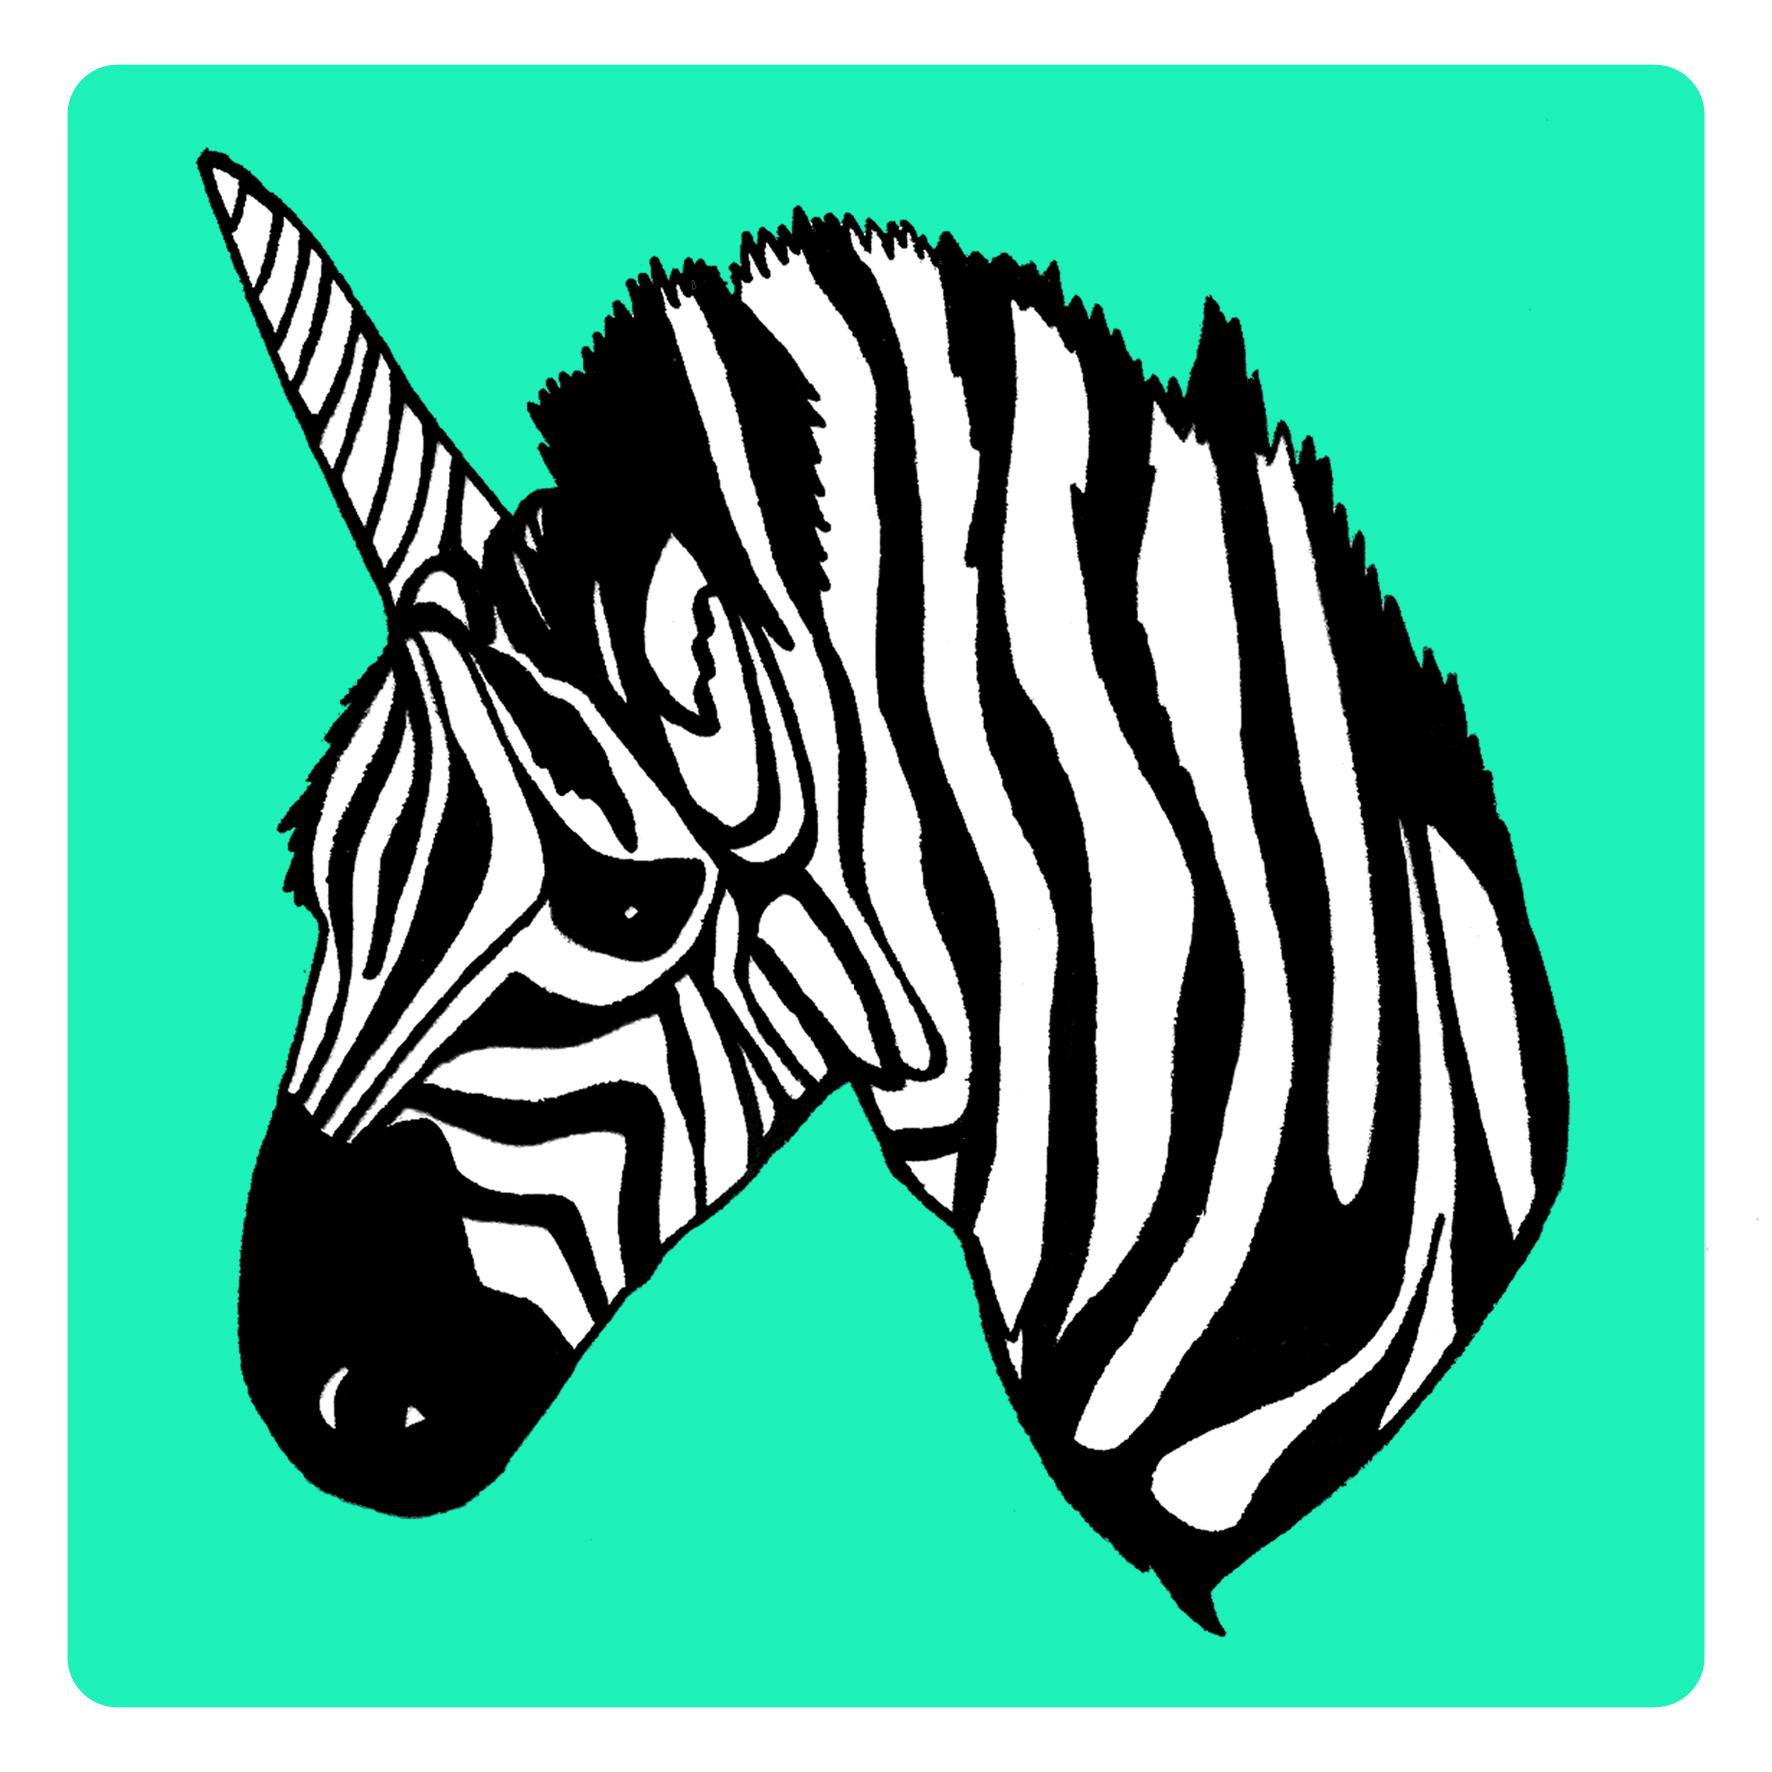 NEW_DESIGNS_Zebra_Unicorn_MINT.jpg